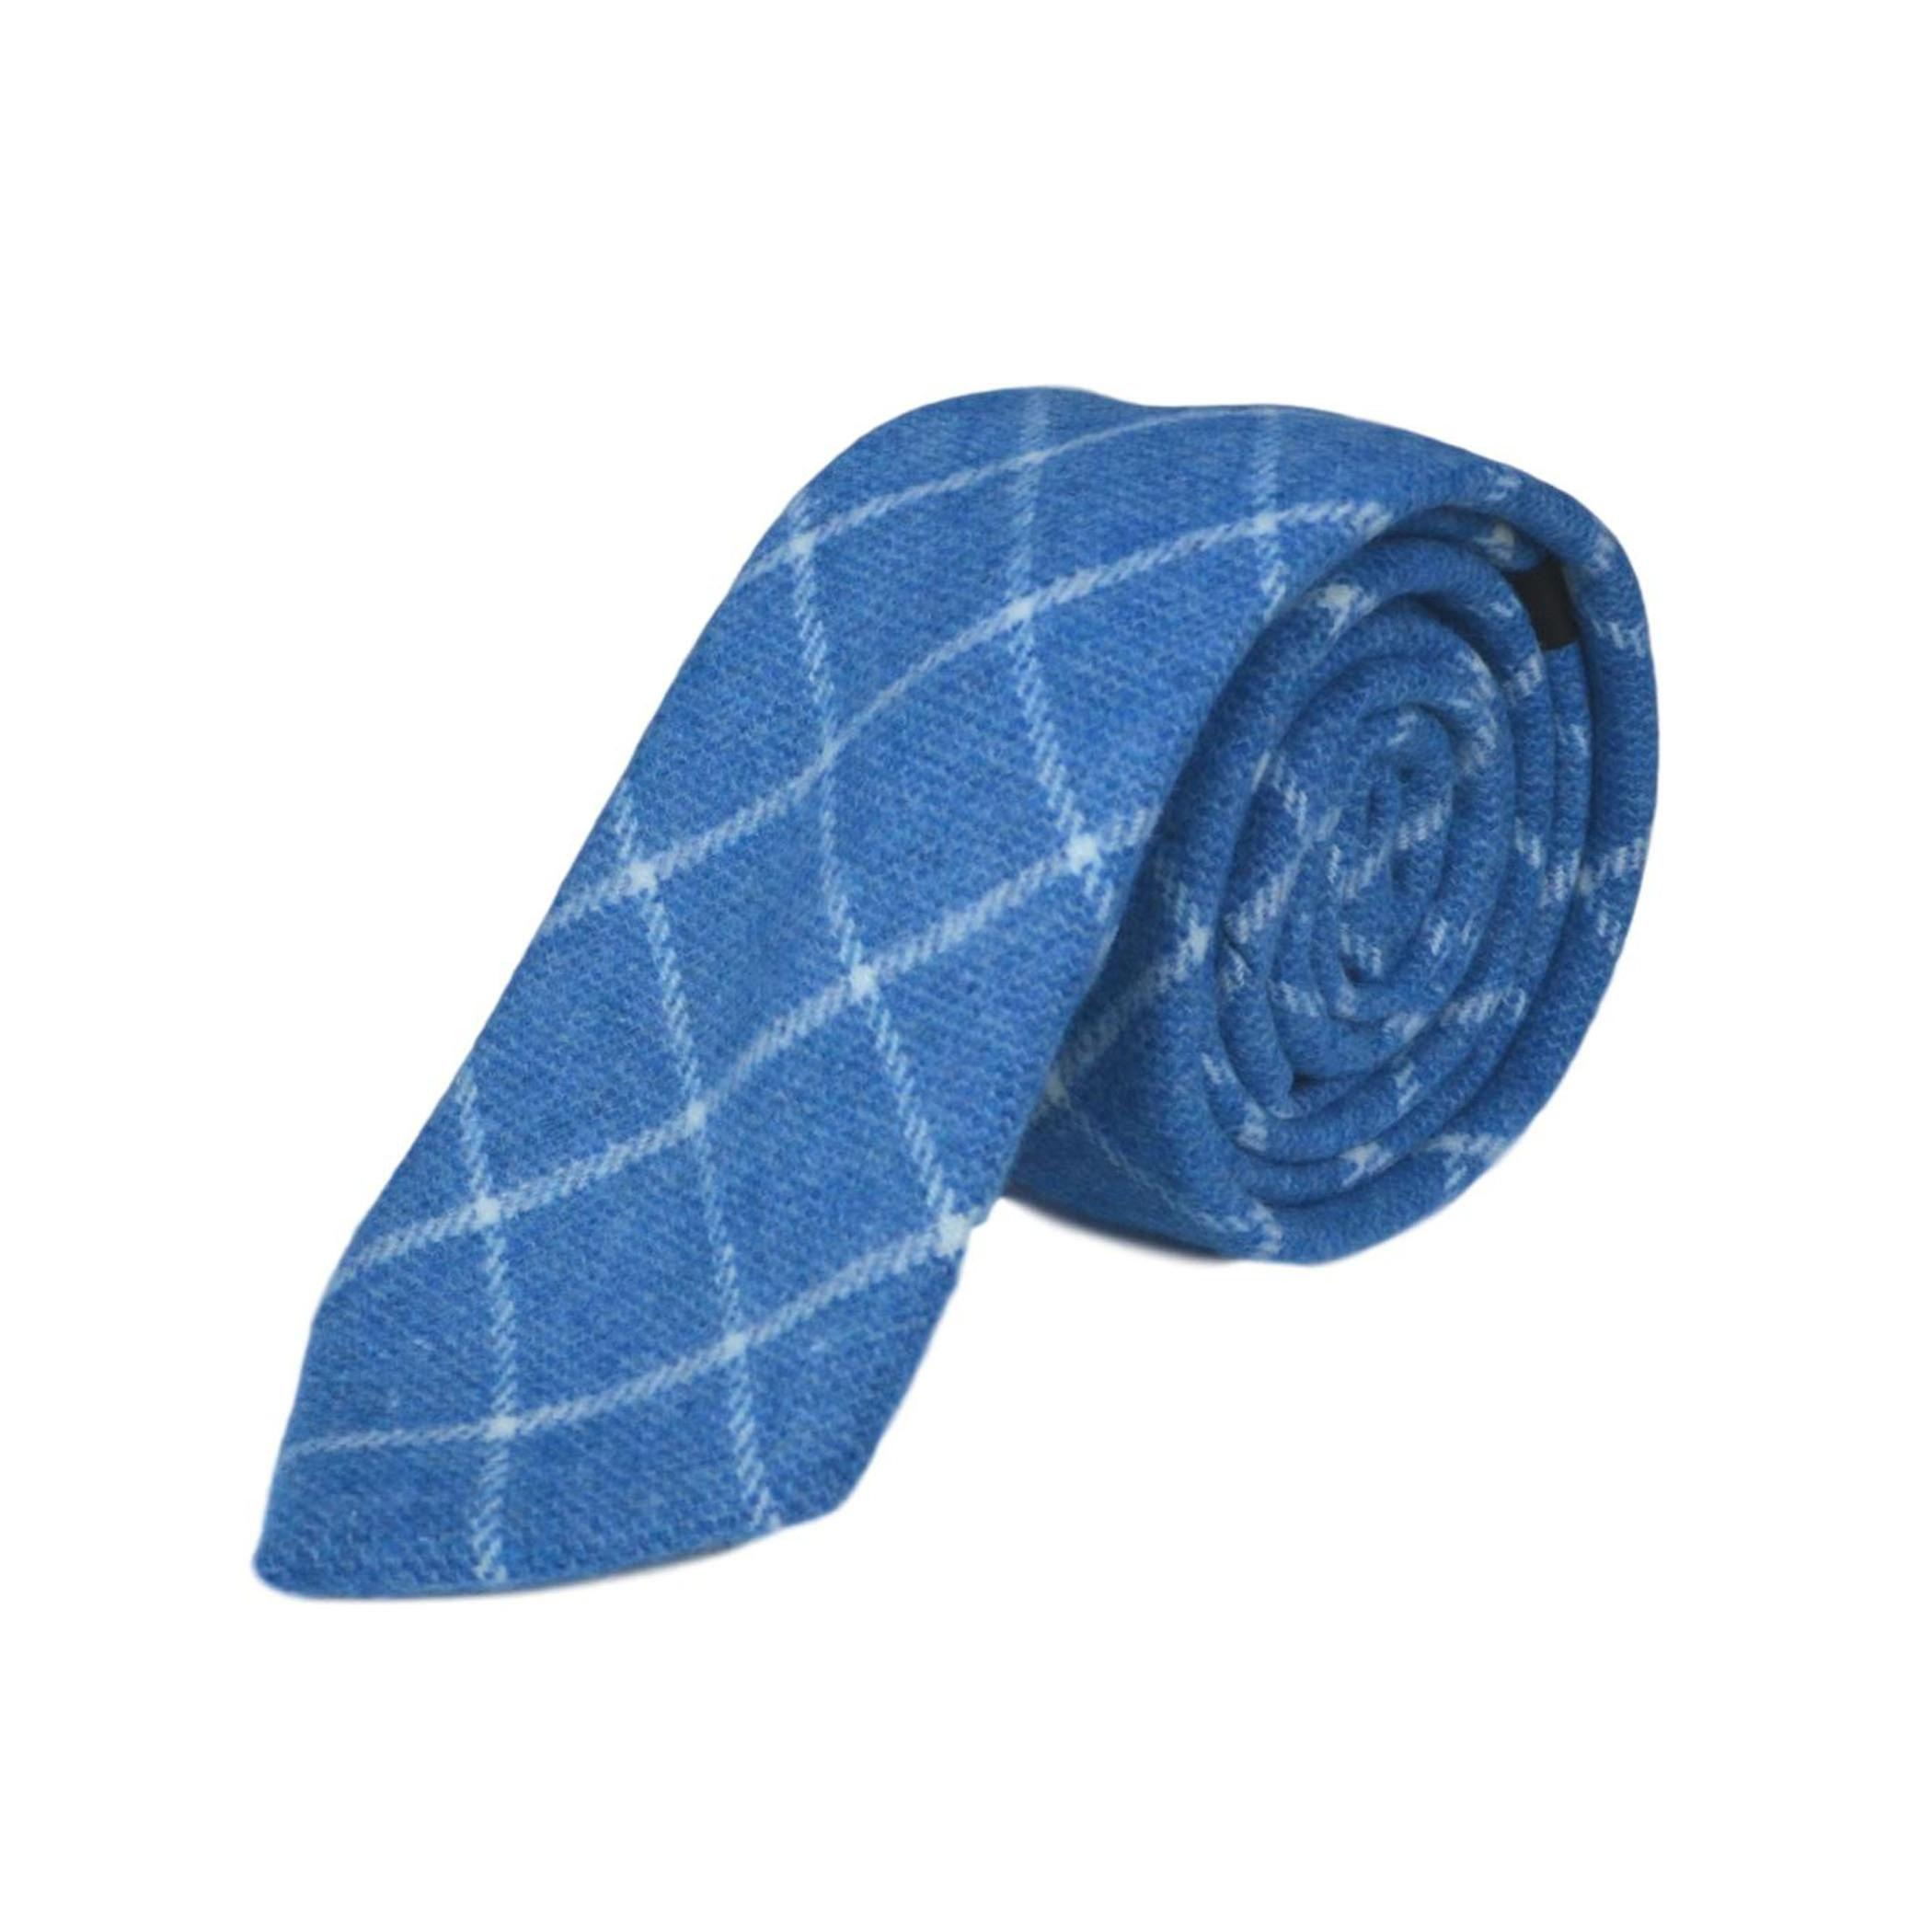 Azure Blue Birdseye Check Tie & Pocket Square Set